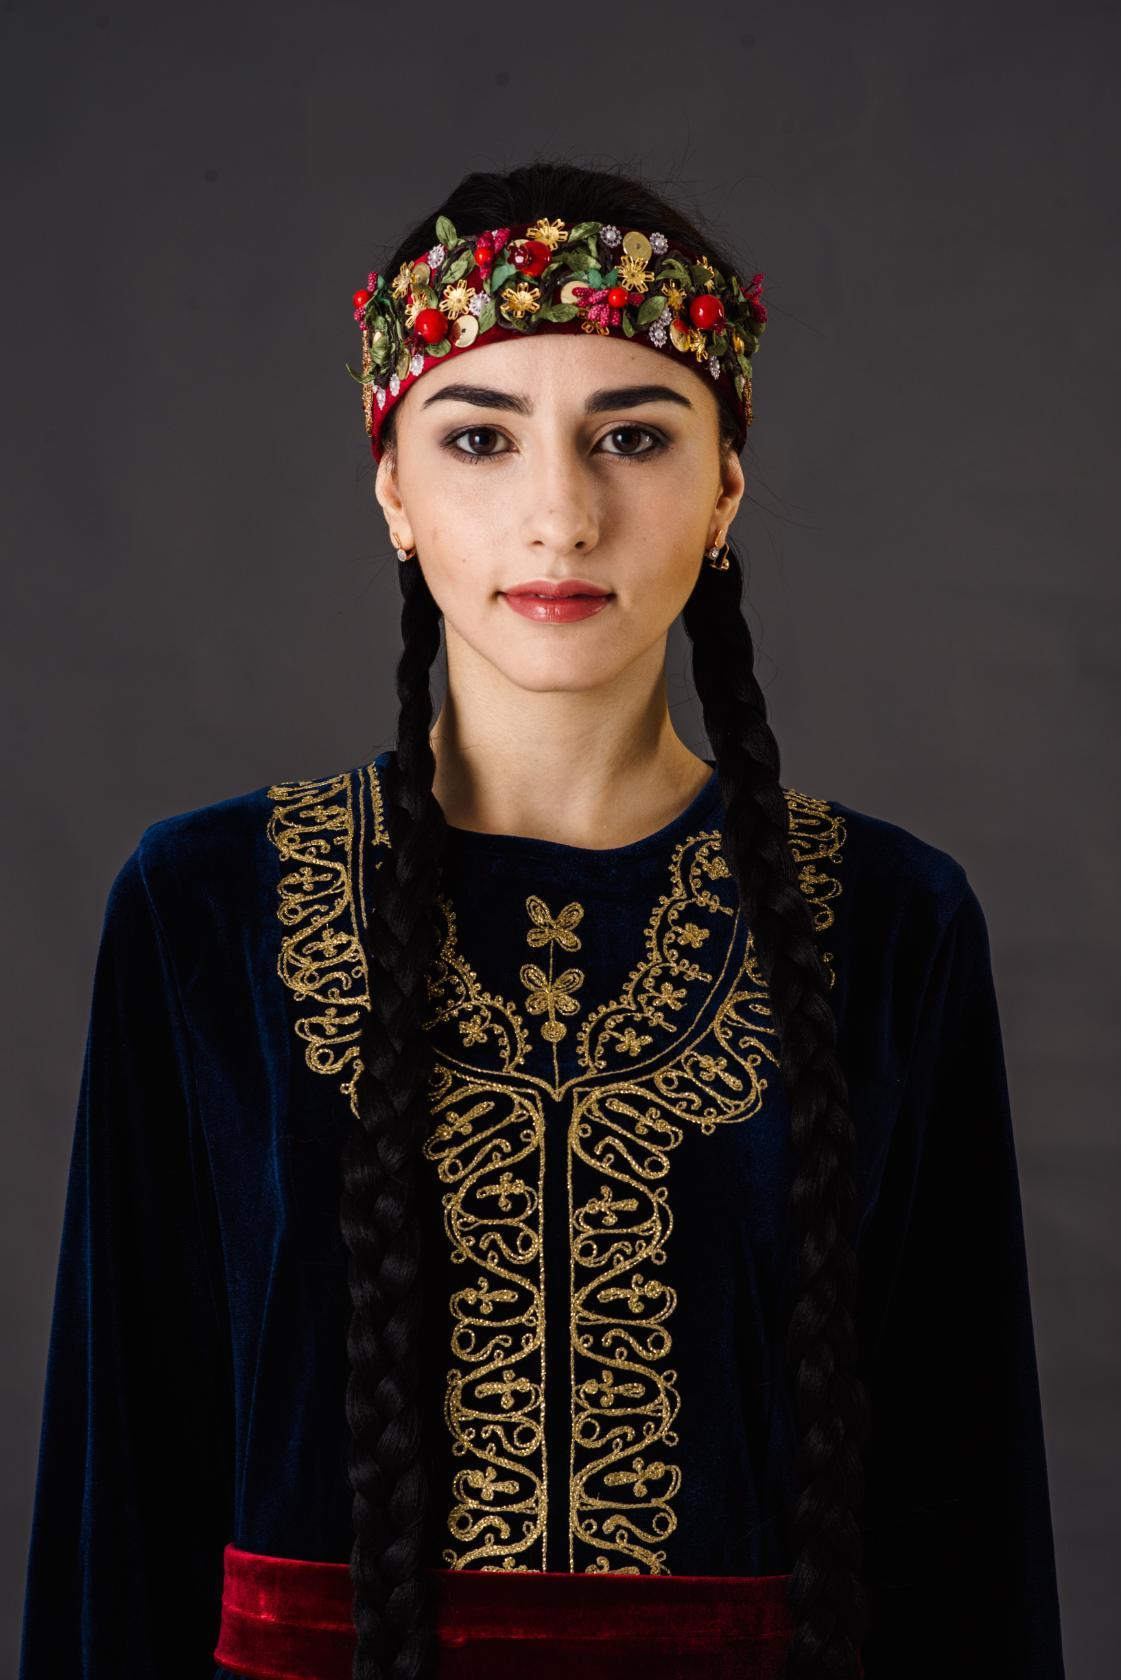 знакомство с армянским национальным костюмом